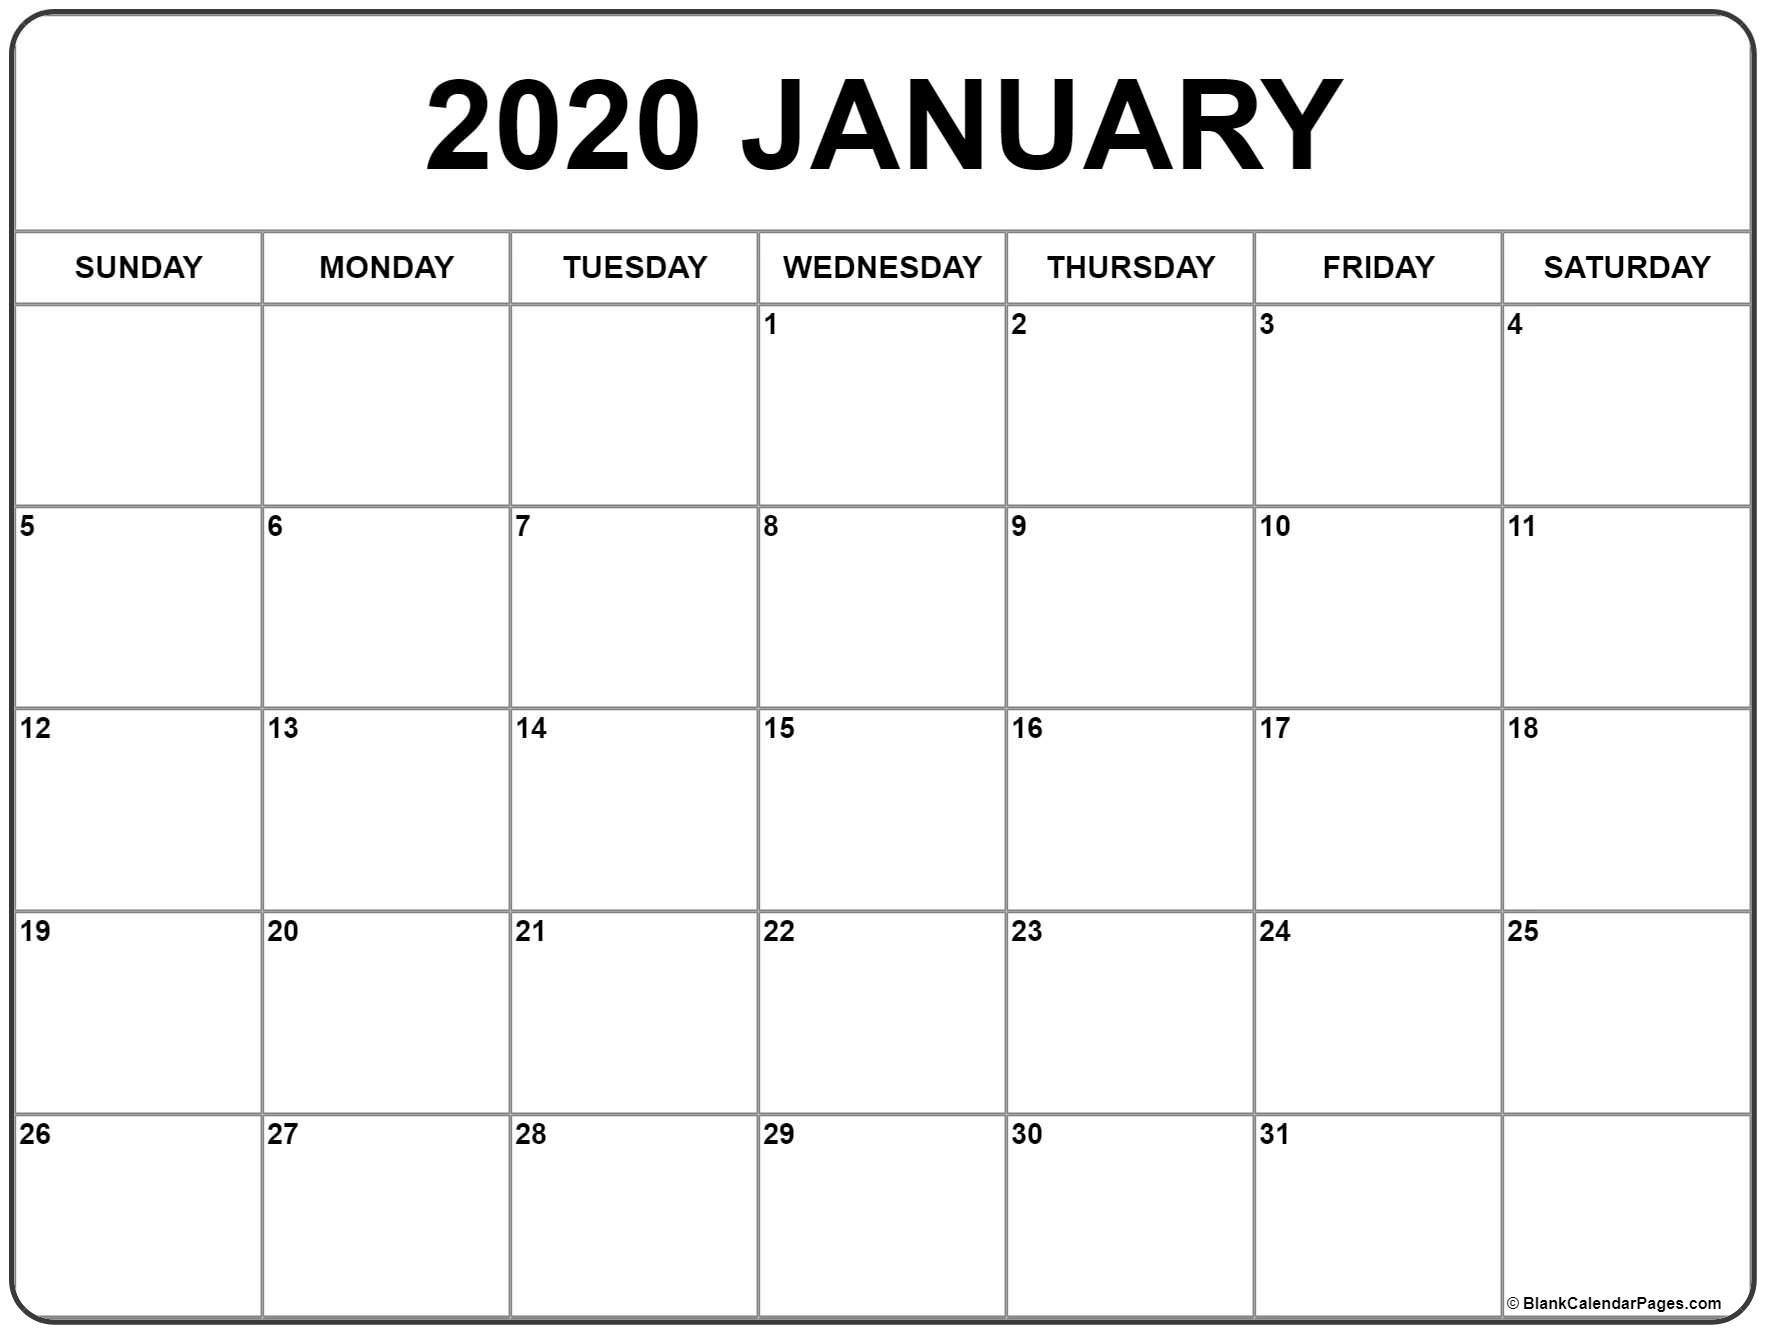 January 2020 Calendar | Free Printable Monthly Calendars-January 2020 Calendar With Holidays South Africa